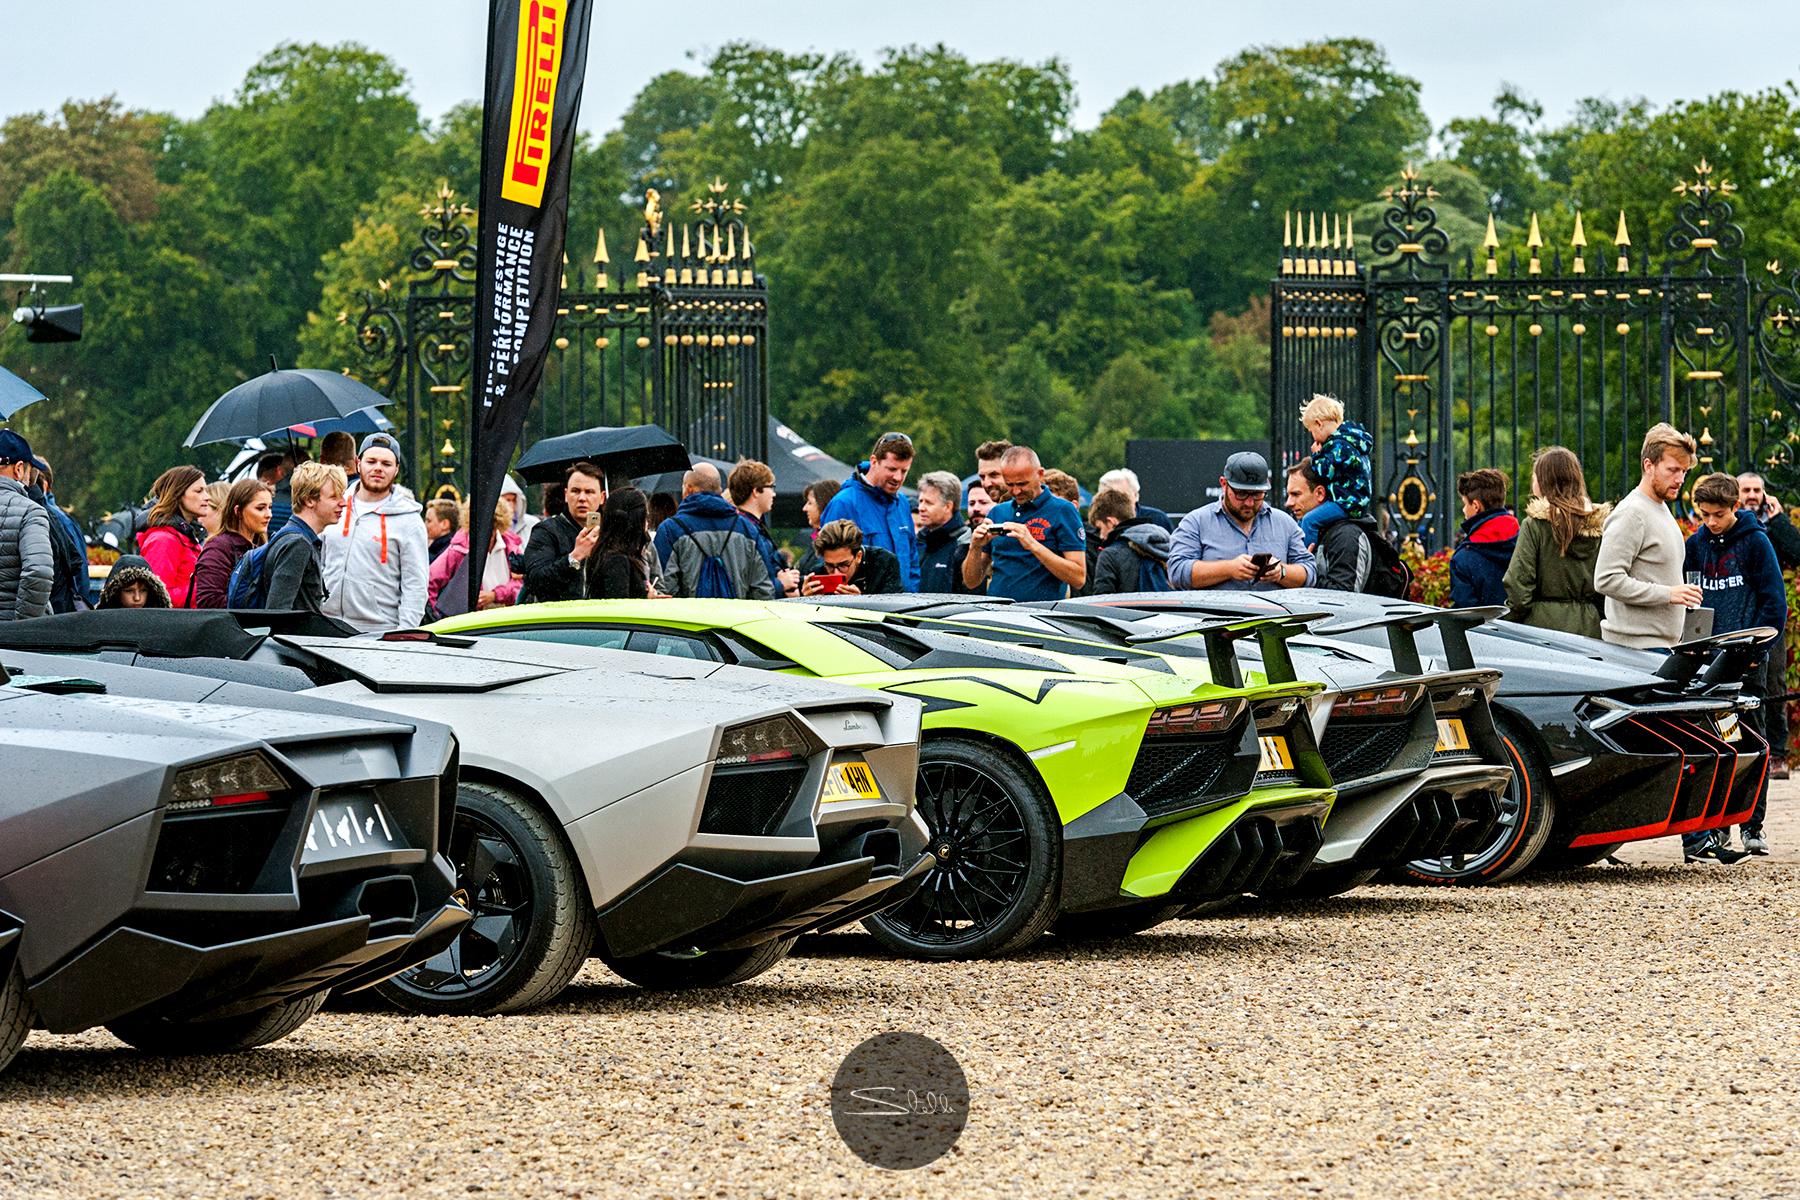 Stella Scordellis Blenheim Palace Classic & Supercar Show 2017 17 Watermarked.jpg